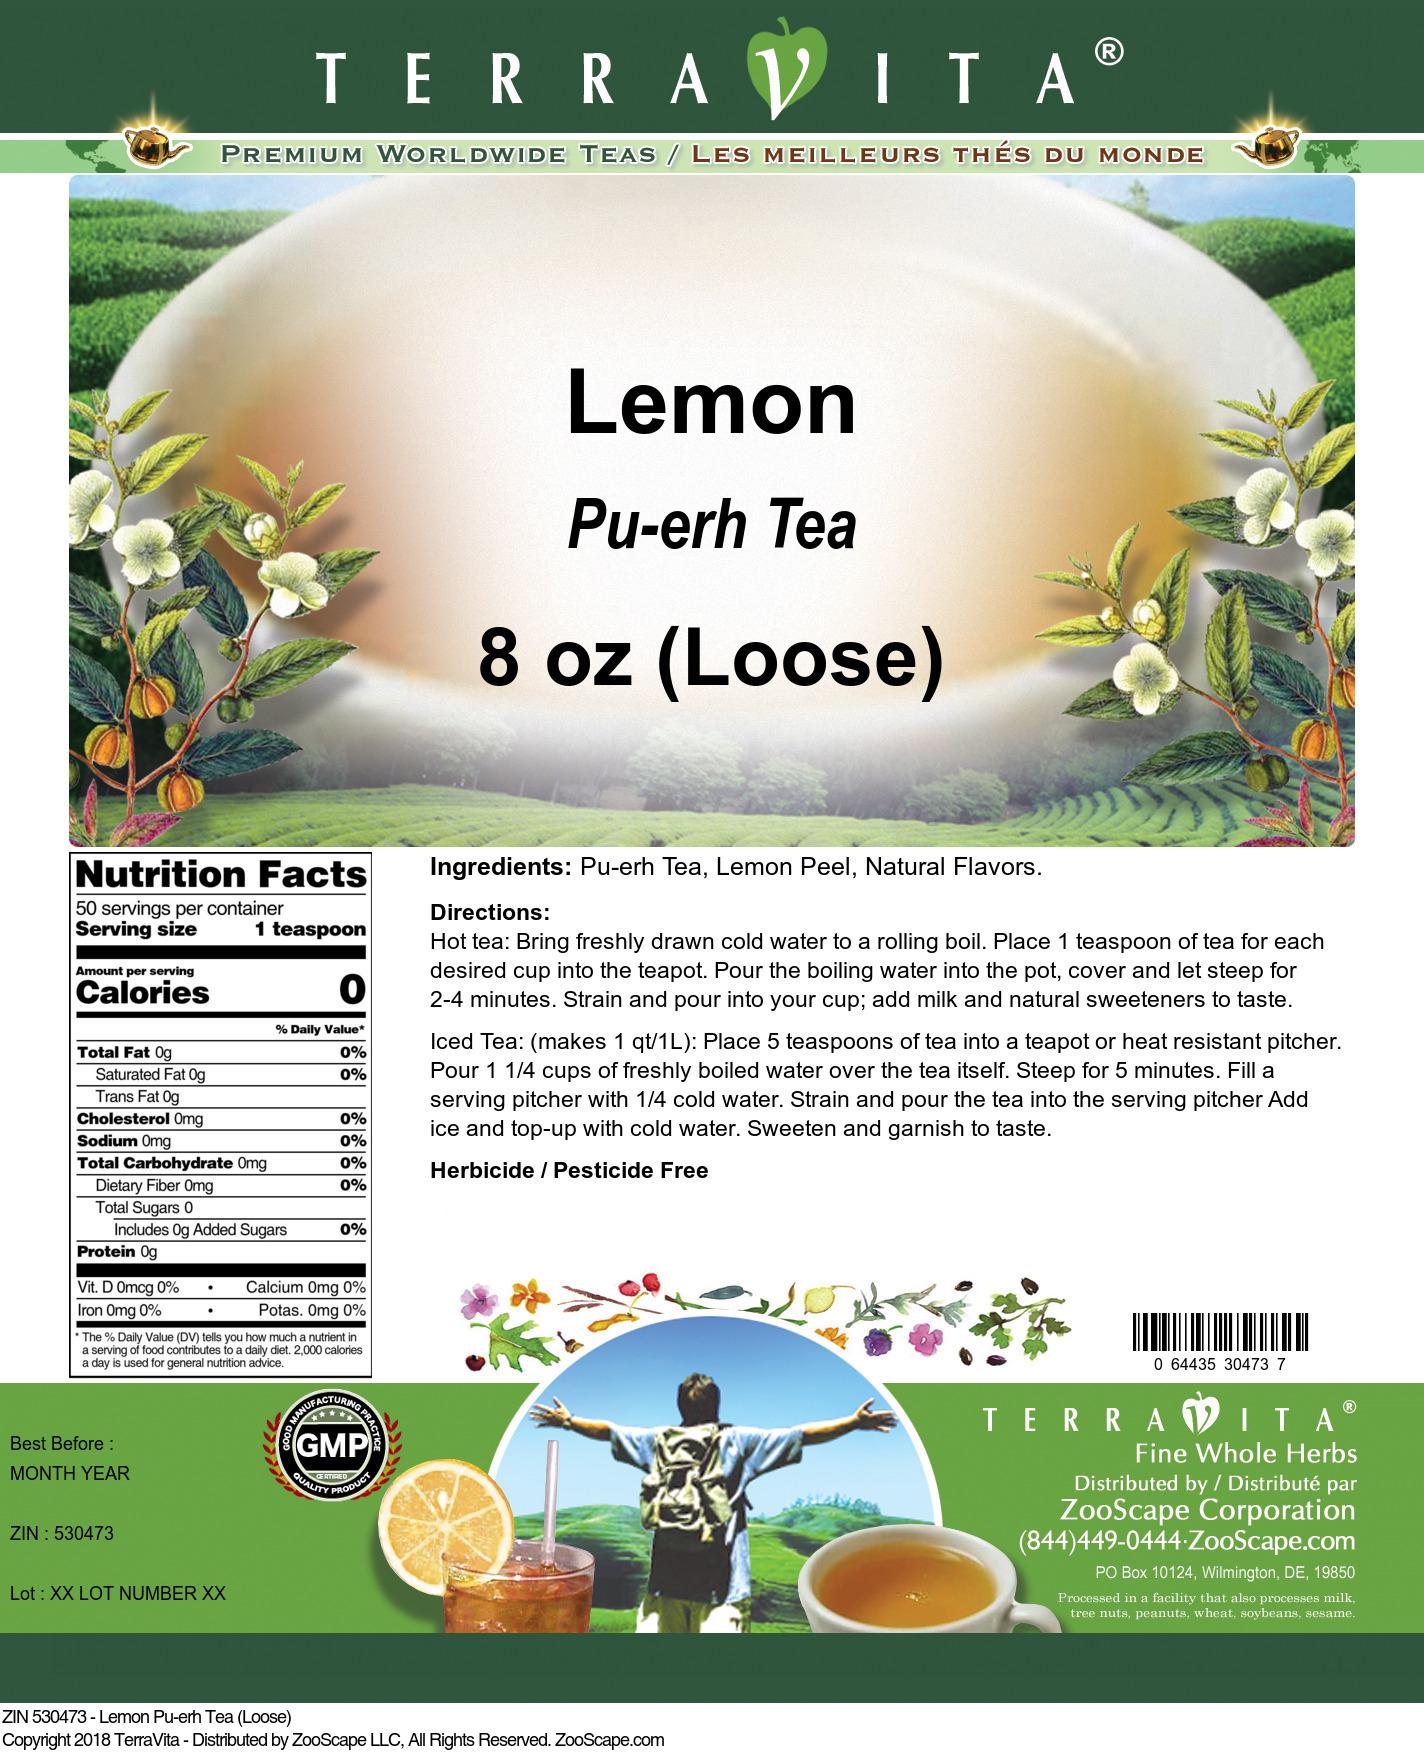 Lemon Pu-erh Tea (Loose)